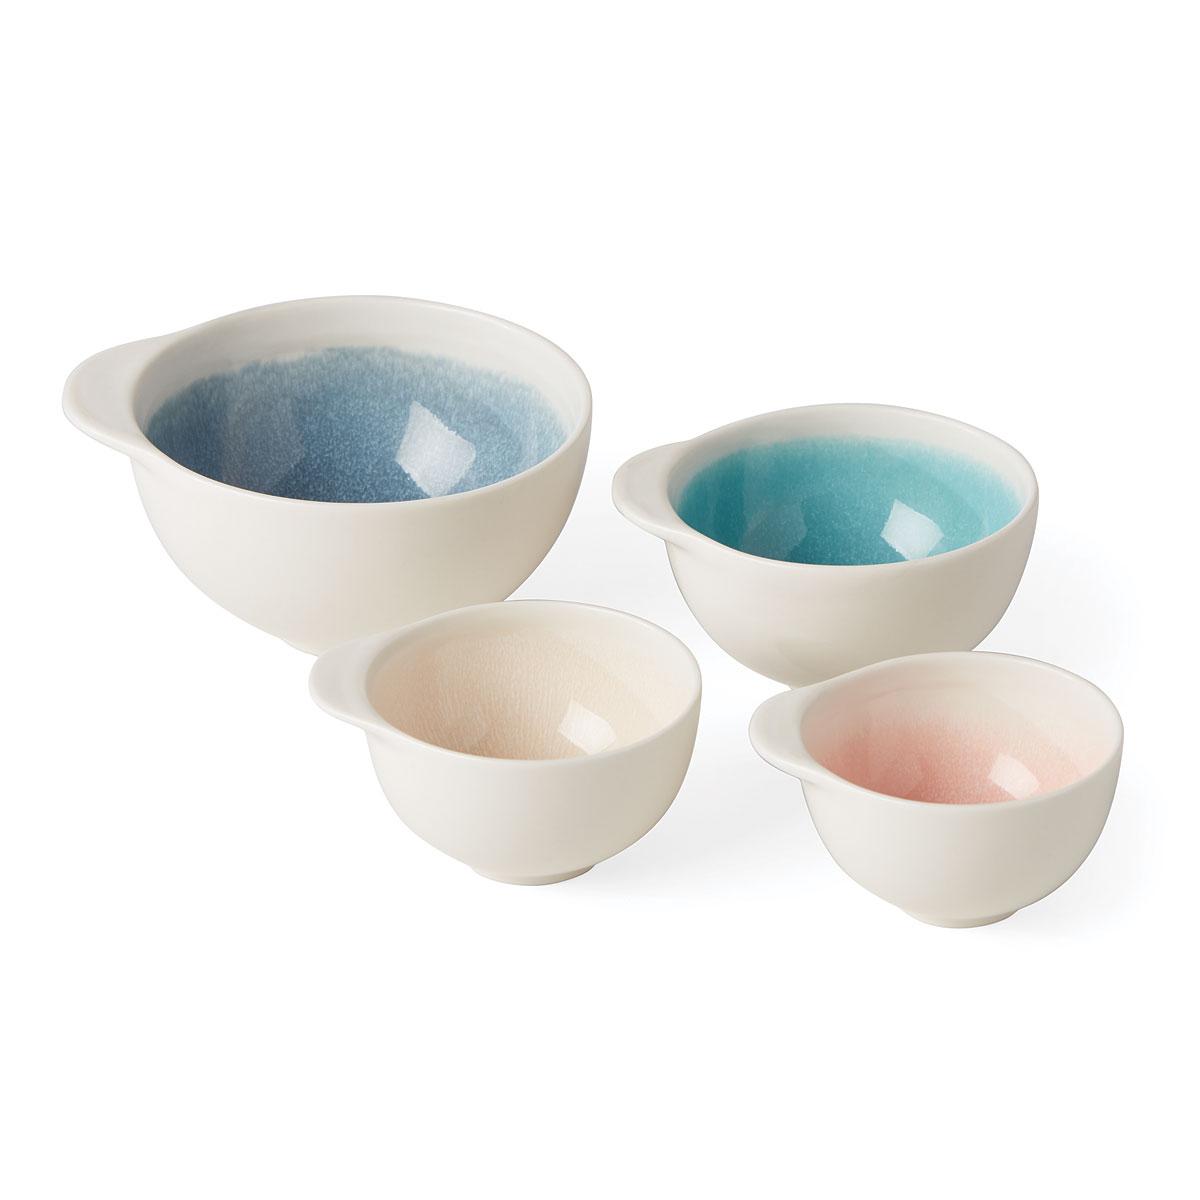 Lenox Naomi Bay Measuring Cups